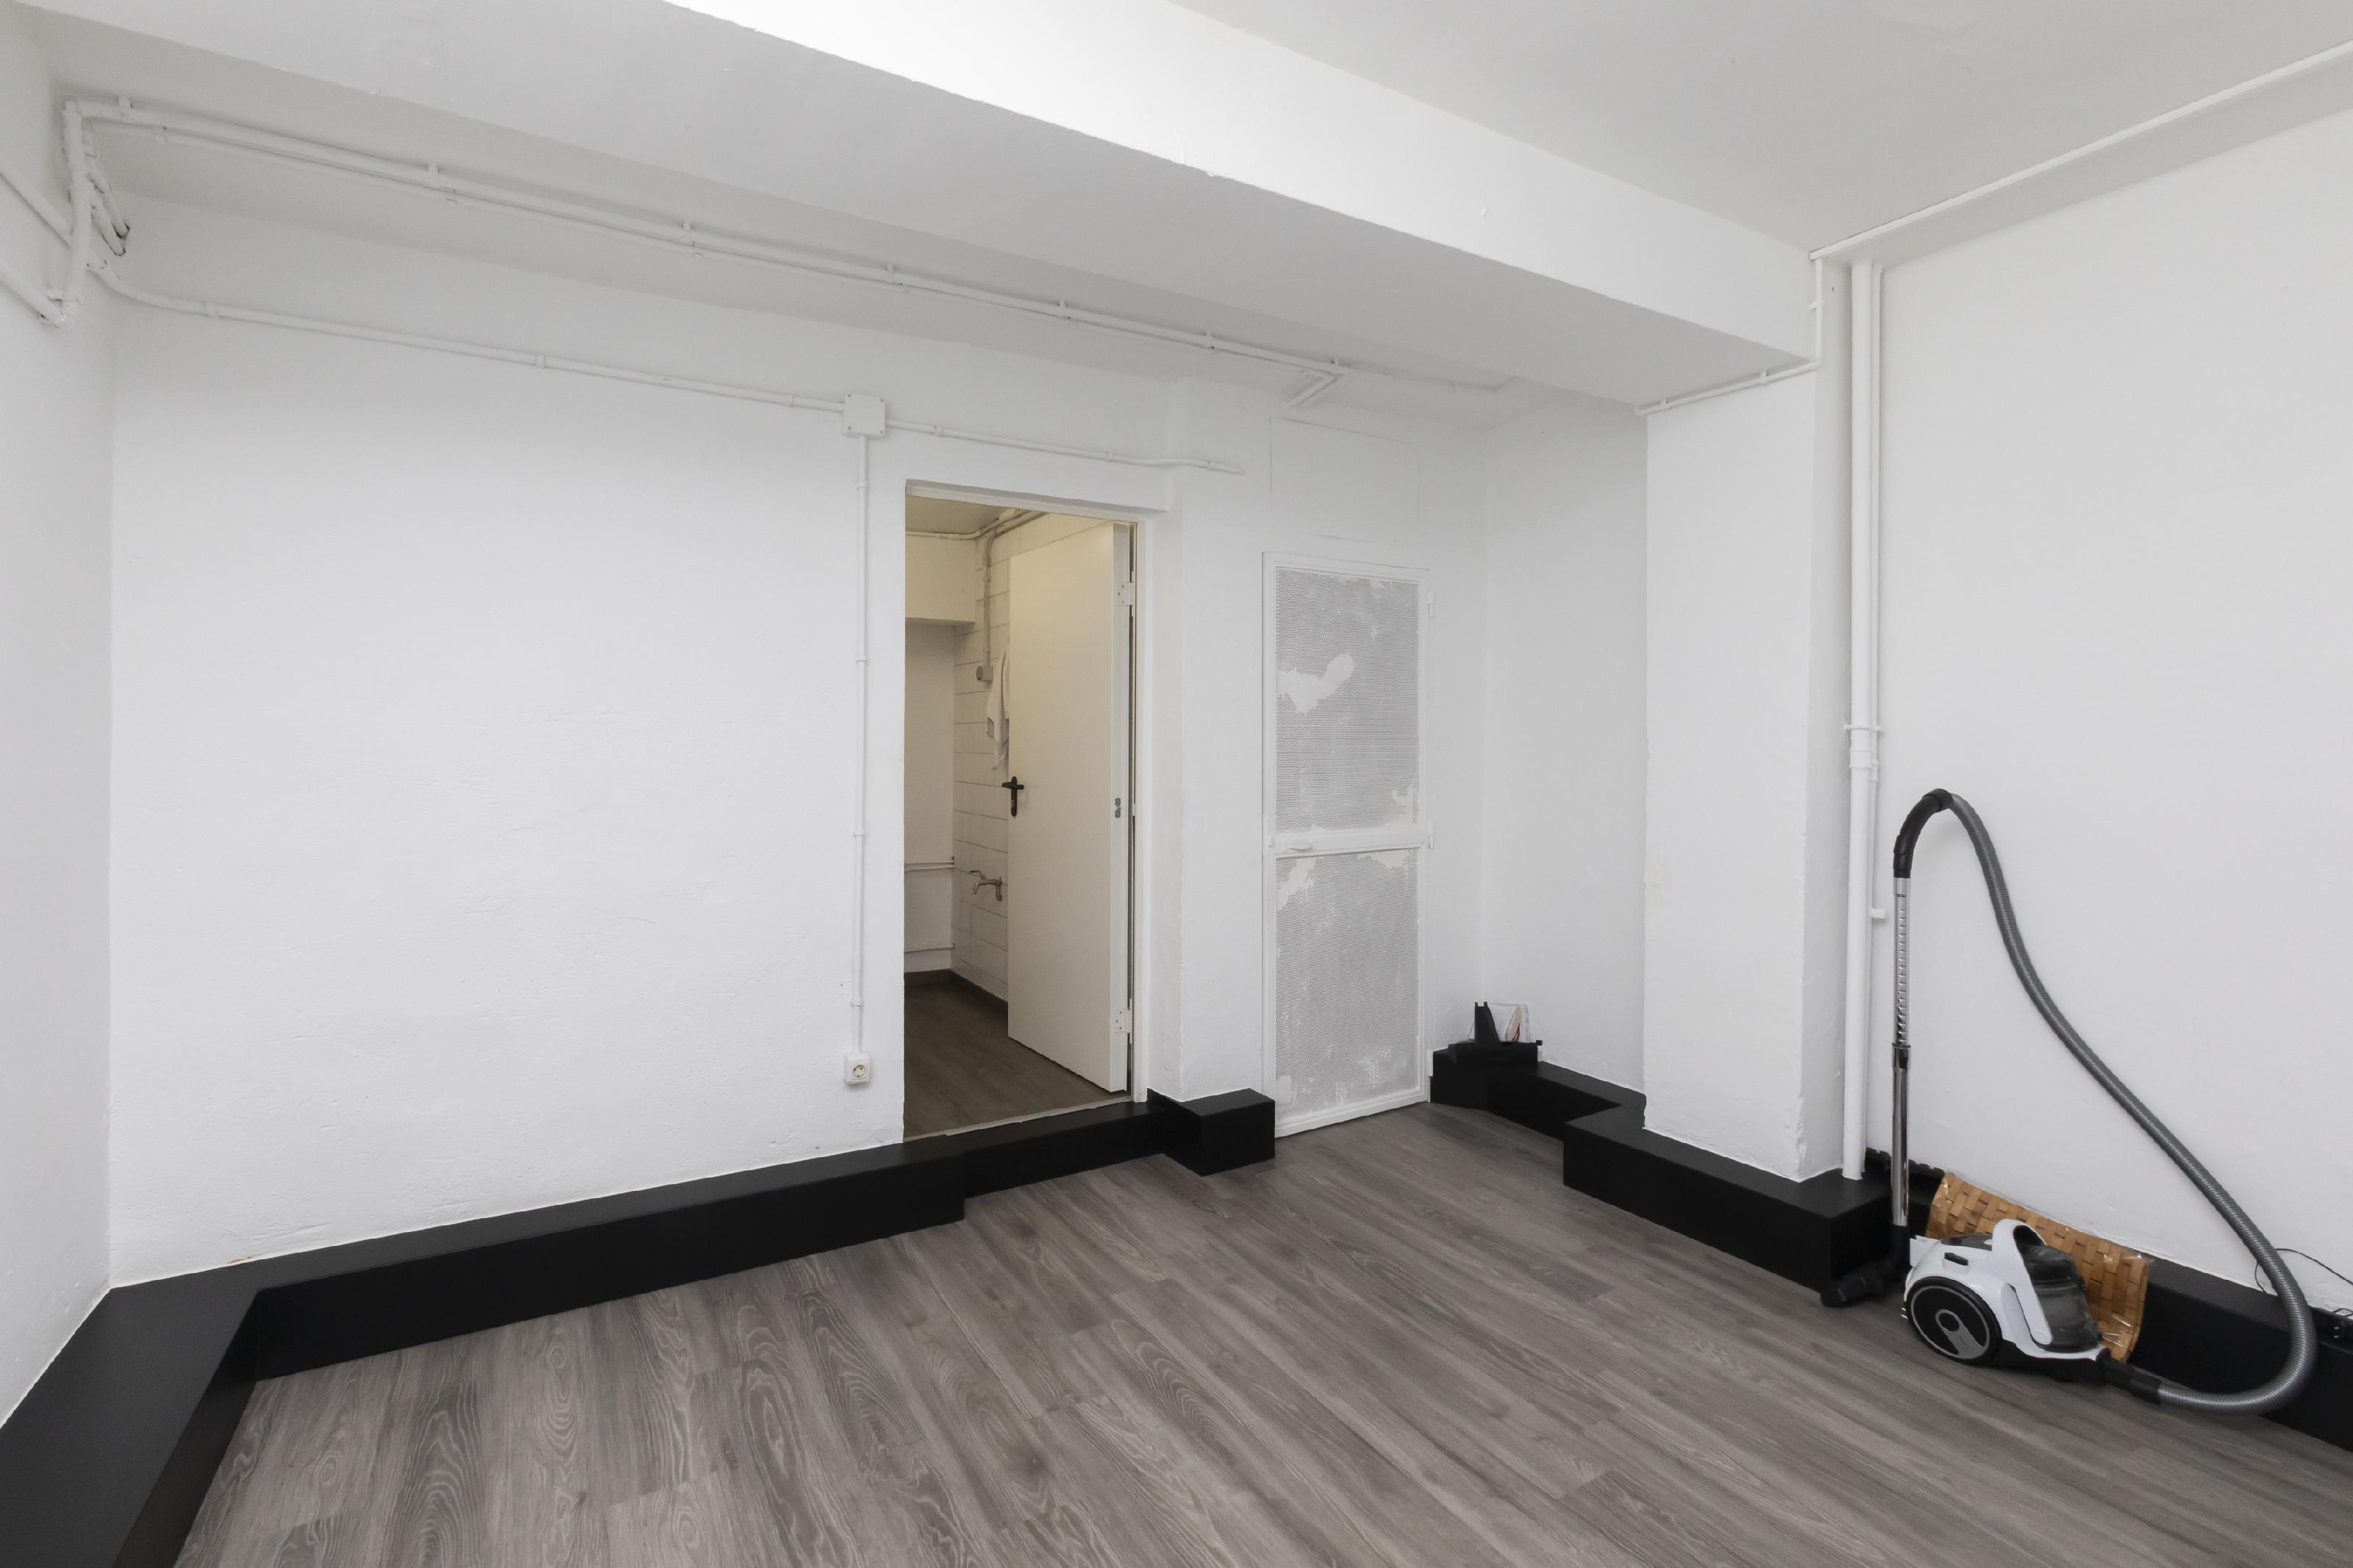 249493 Commercial premises for sale in Sarrià-Sant Gervasi, Sant Gervasi-Galvany 15